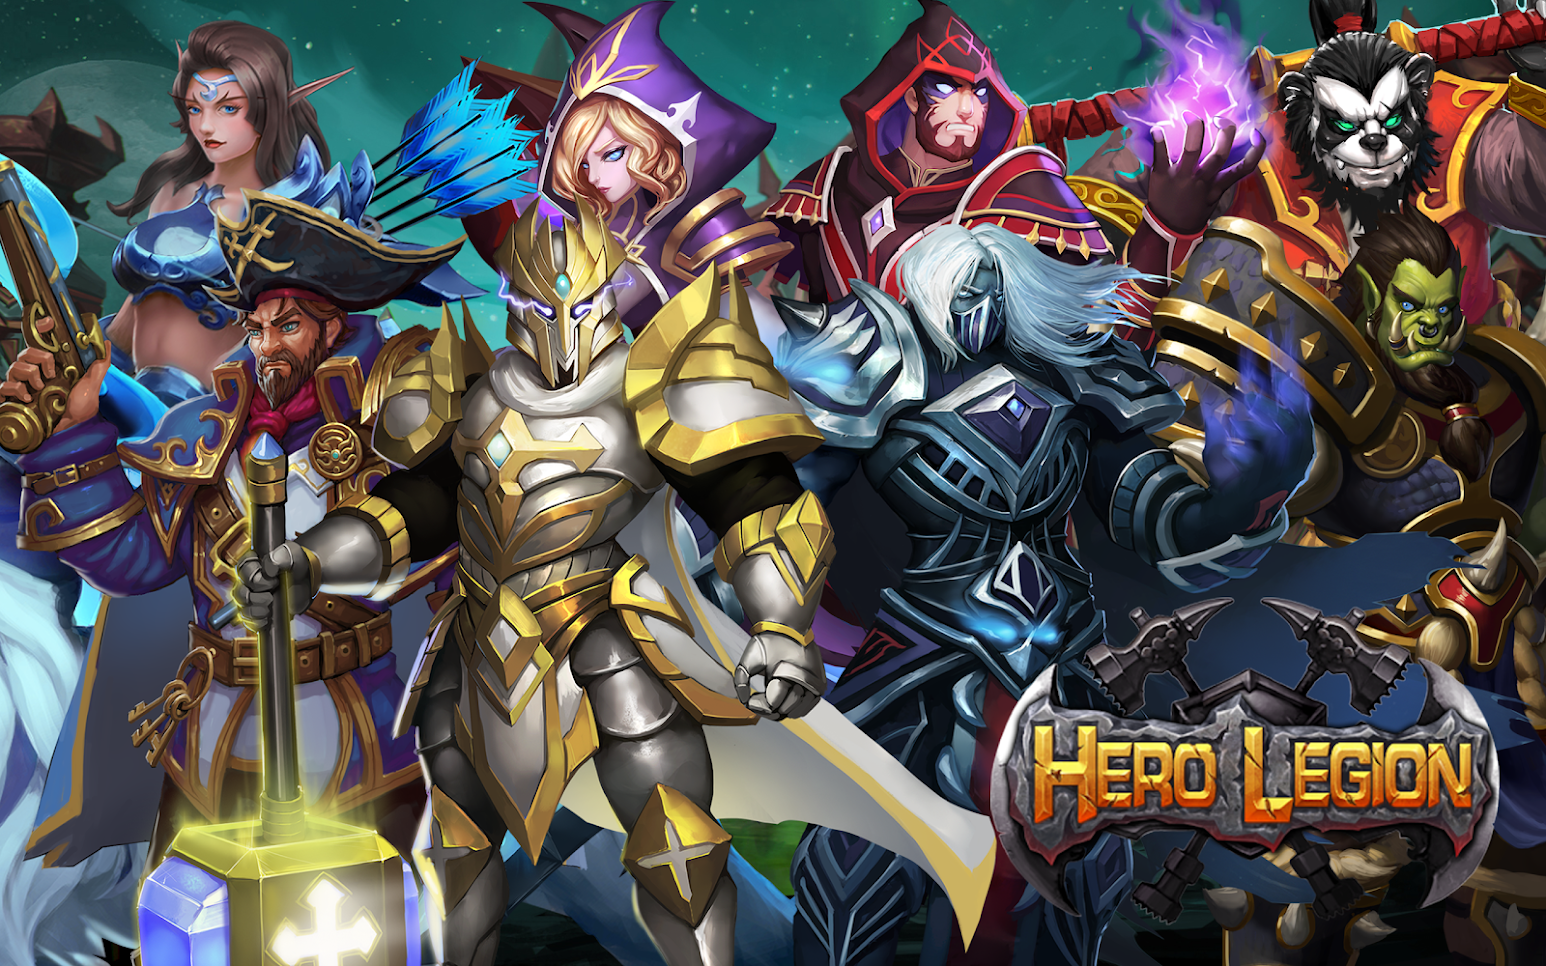 hack Game Hero Legion Online - 3d Real Time Tactical Mmo Rpg V1.0.1 Mod | Menu Mod | God Mode WtPR9rDfkwEGn5qsMR7LaL8mH7OvVl59ZjP80YlpWuir3jIvfzY-L3aAaAqL6Khsa8g=w1699-h966